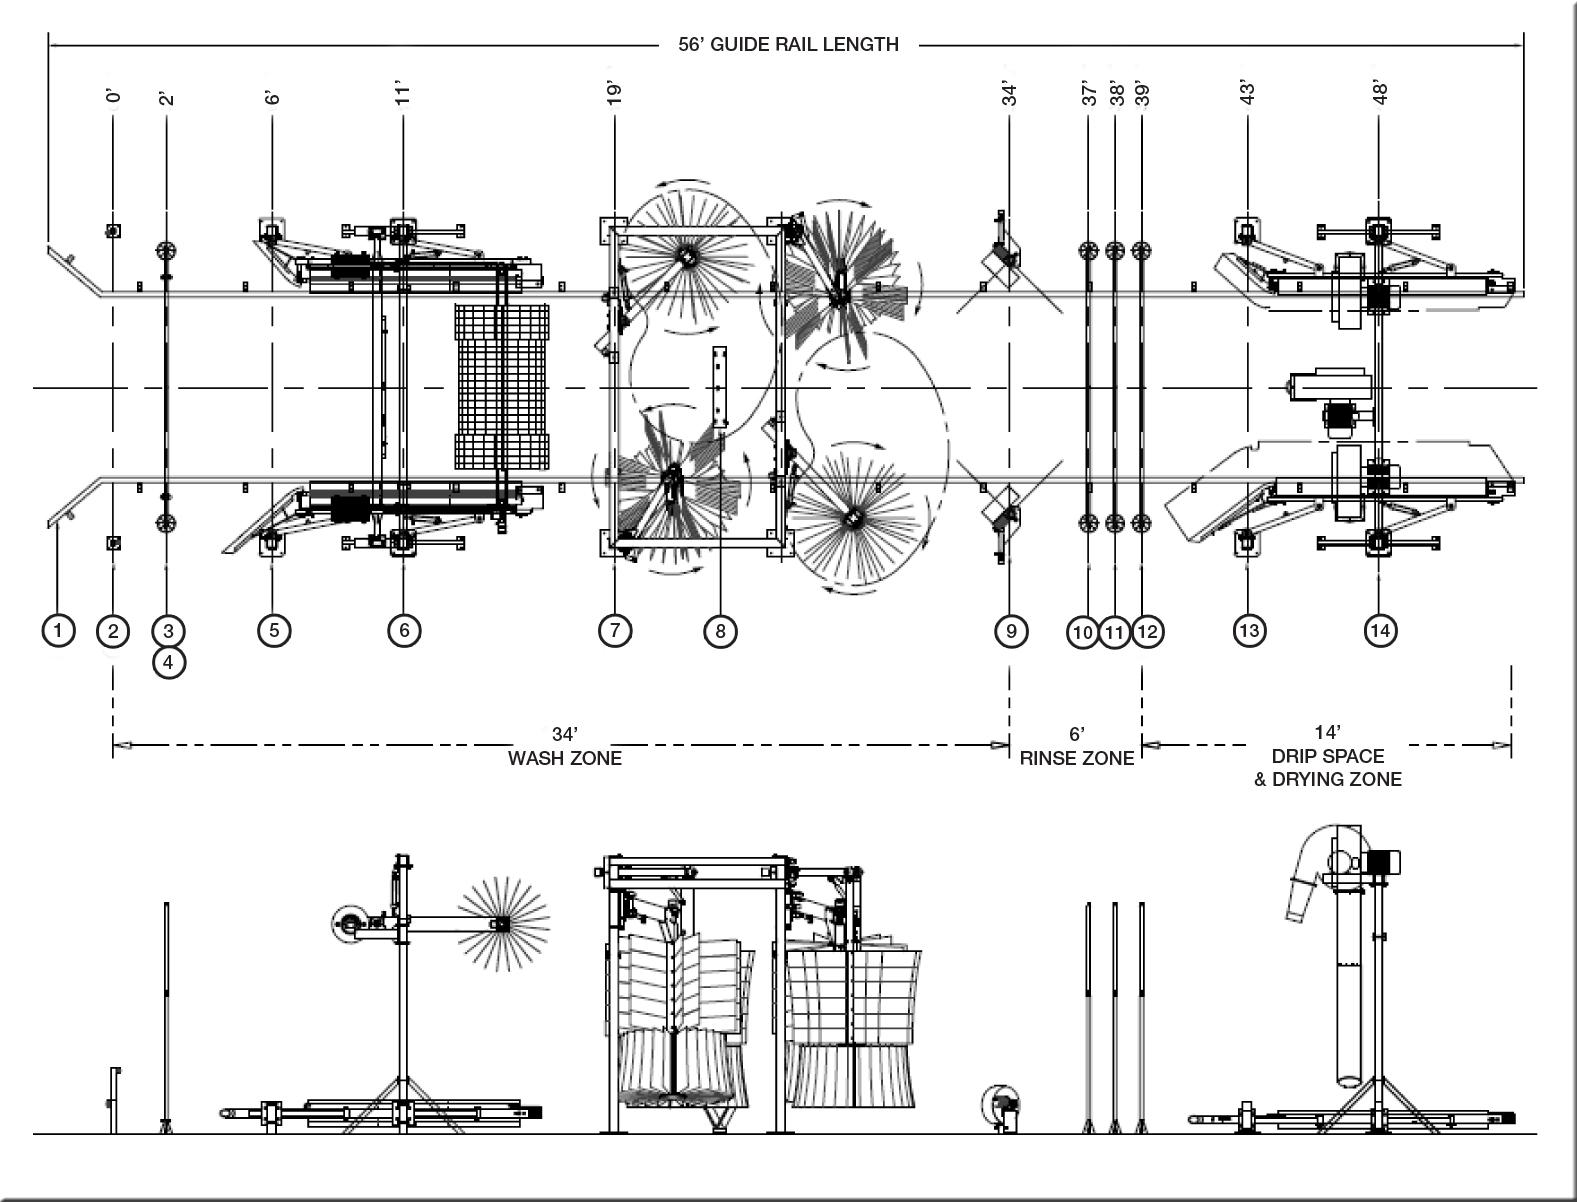 Drive Thru Systems Coleman Hanna Carwash Systems